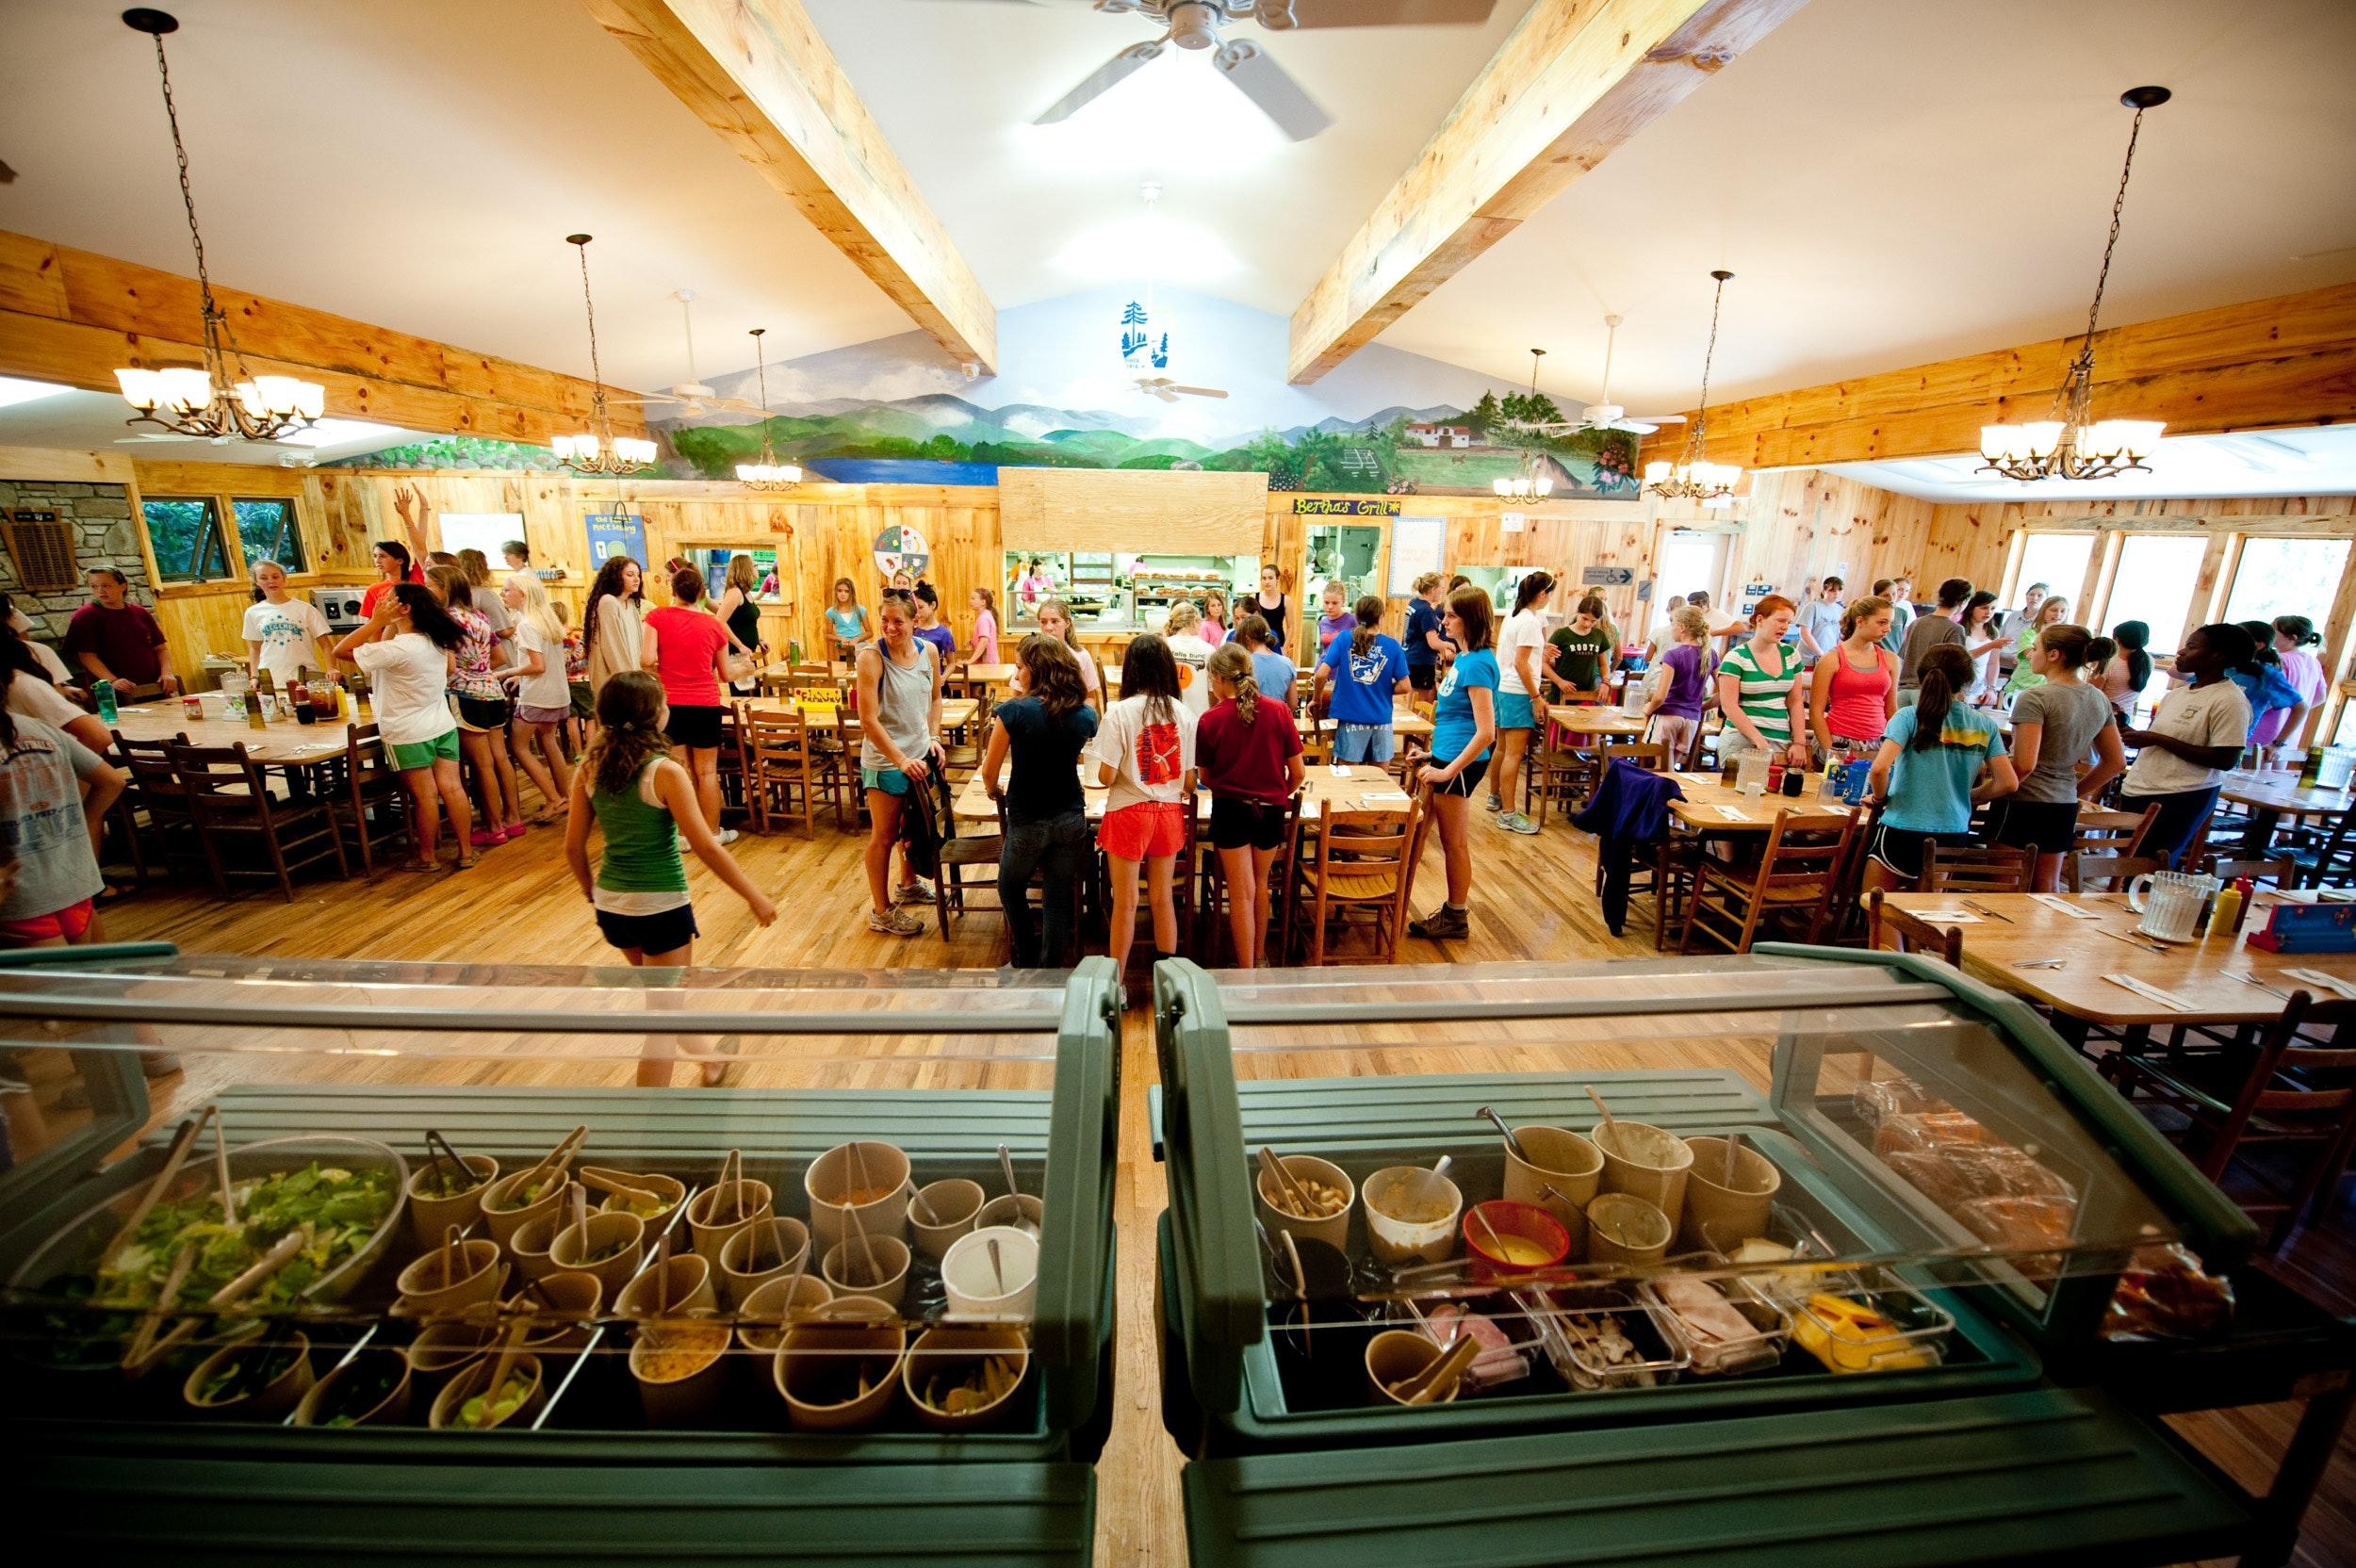 Dining hall at keystone summer camp for girls in north carolina.jpg?ixlib=rails 2.1